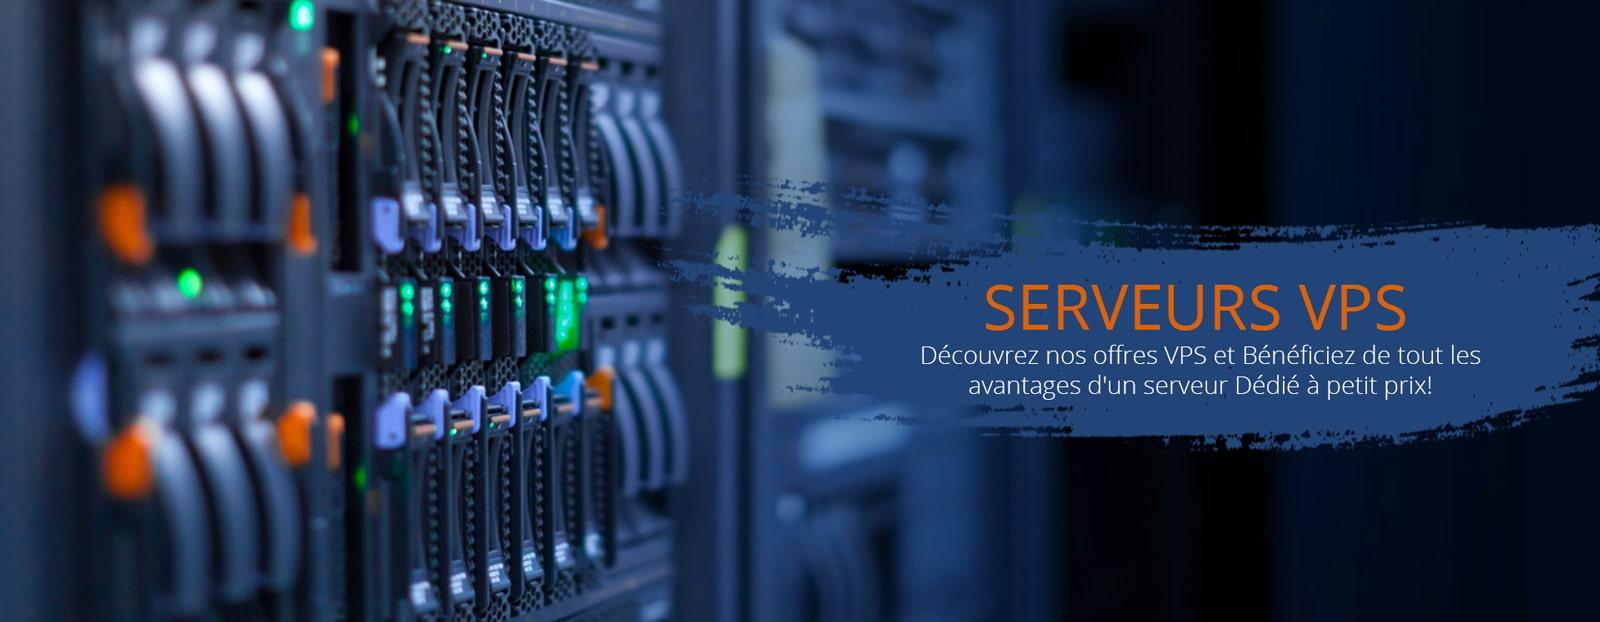 vps-Maroc - Hébergement VPS Maroc Serveur dédié Maroc cloud maroc